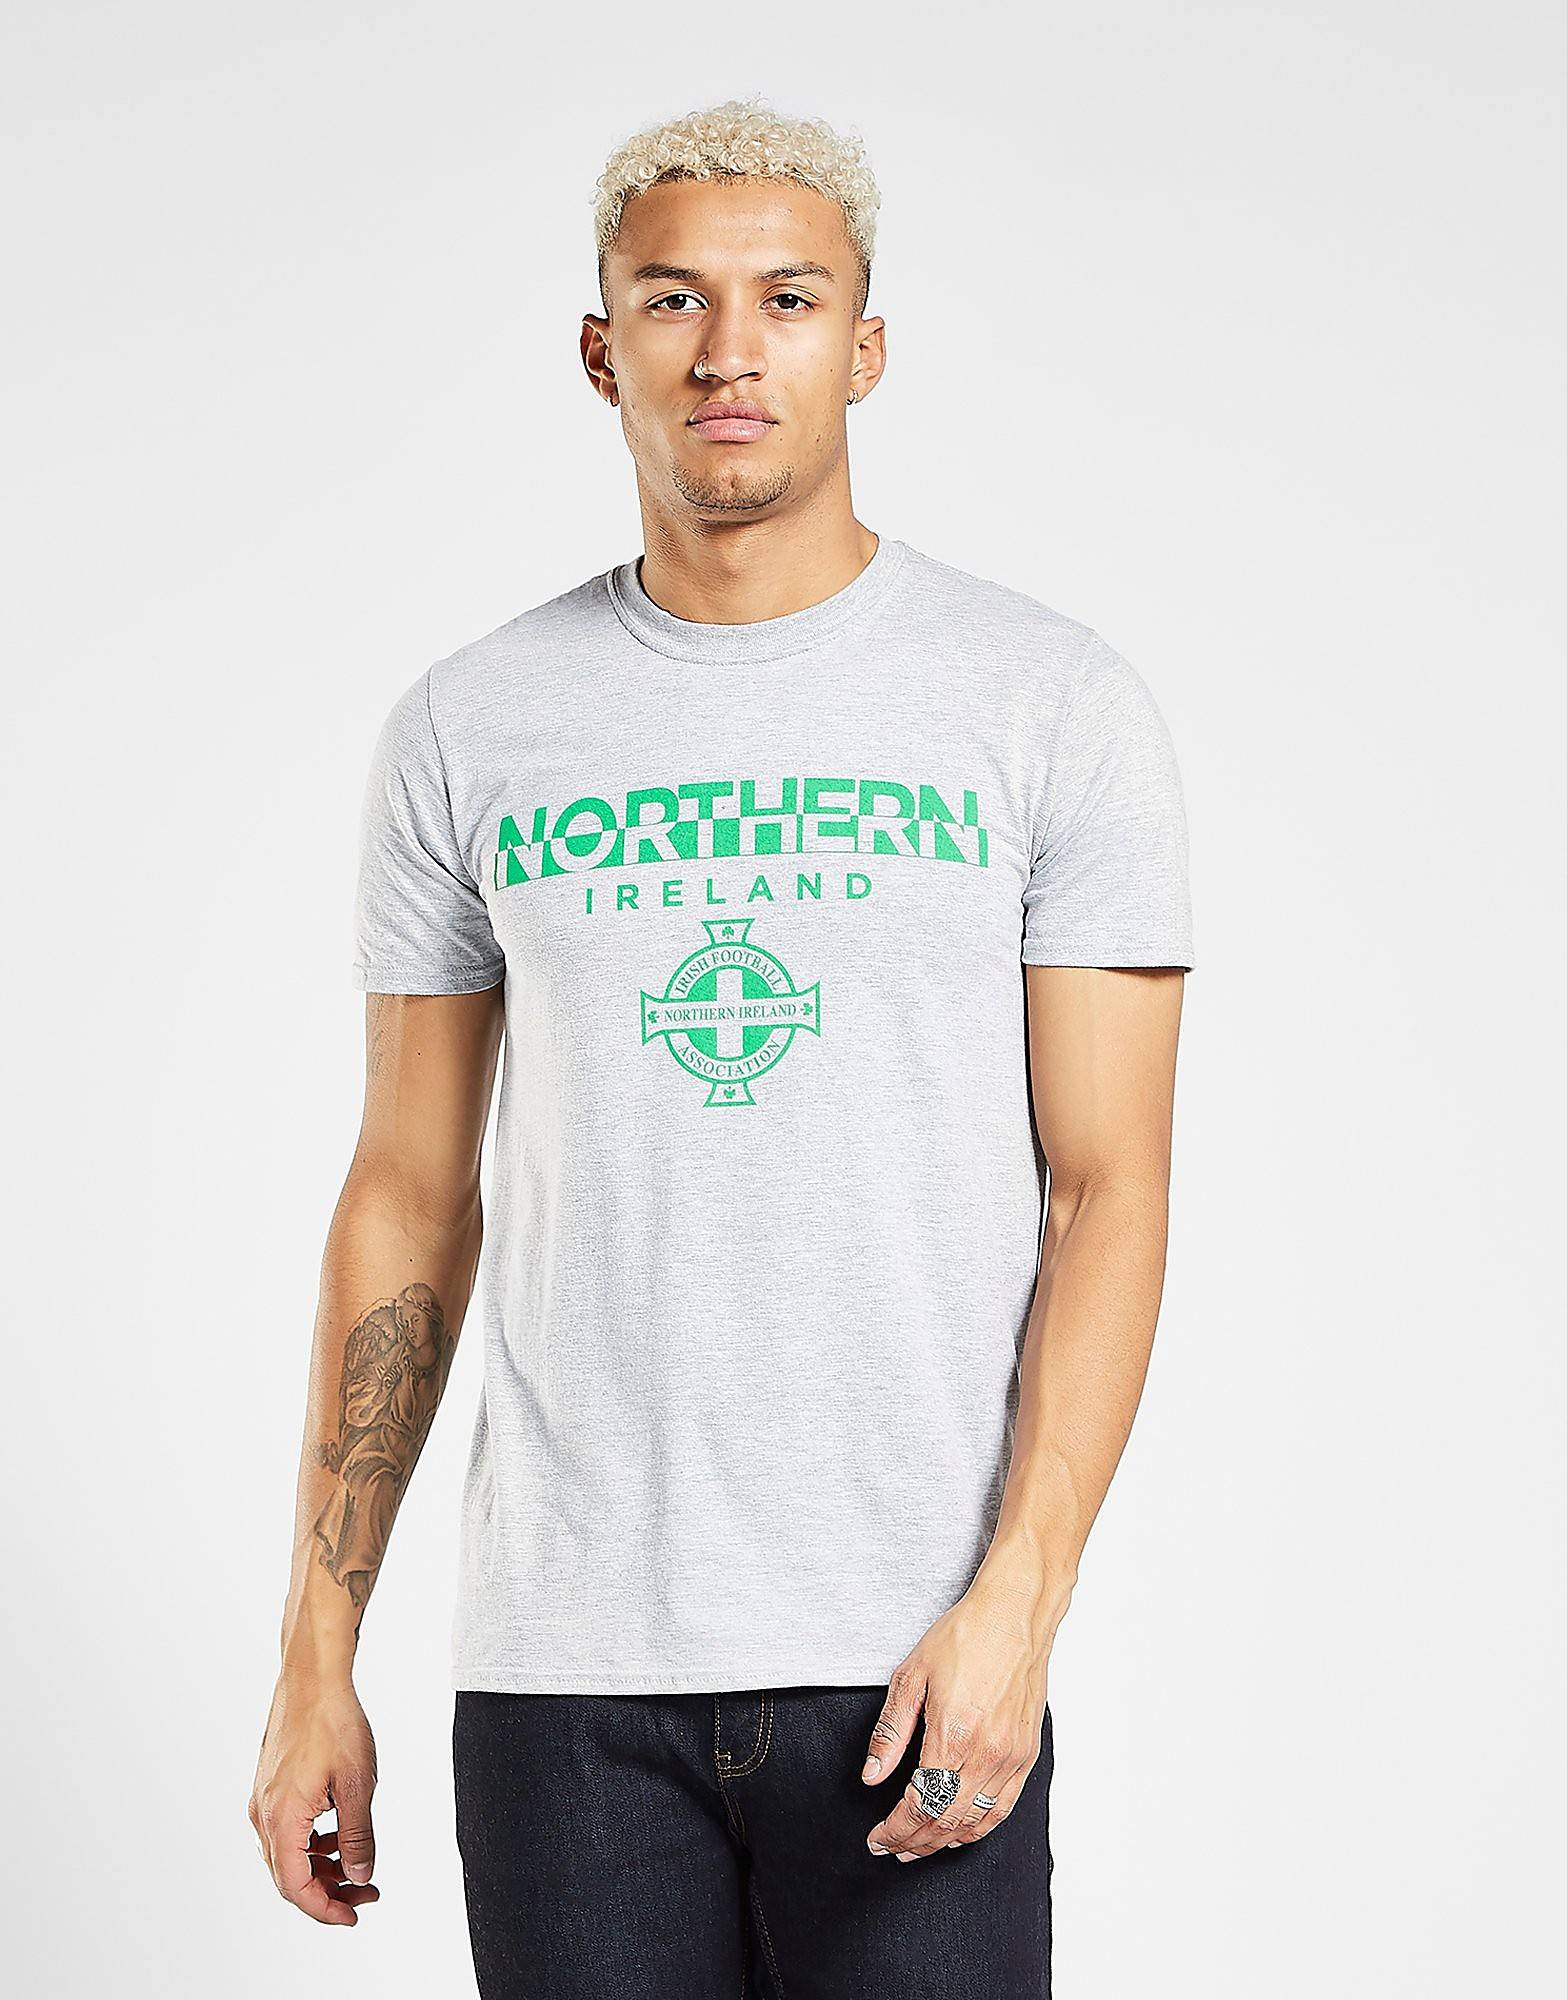 Official Team Northern Ireland Split T-paita - Mens, Harmaa